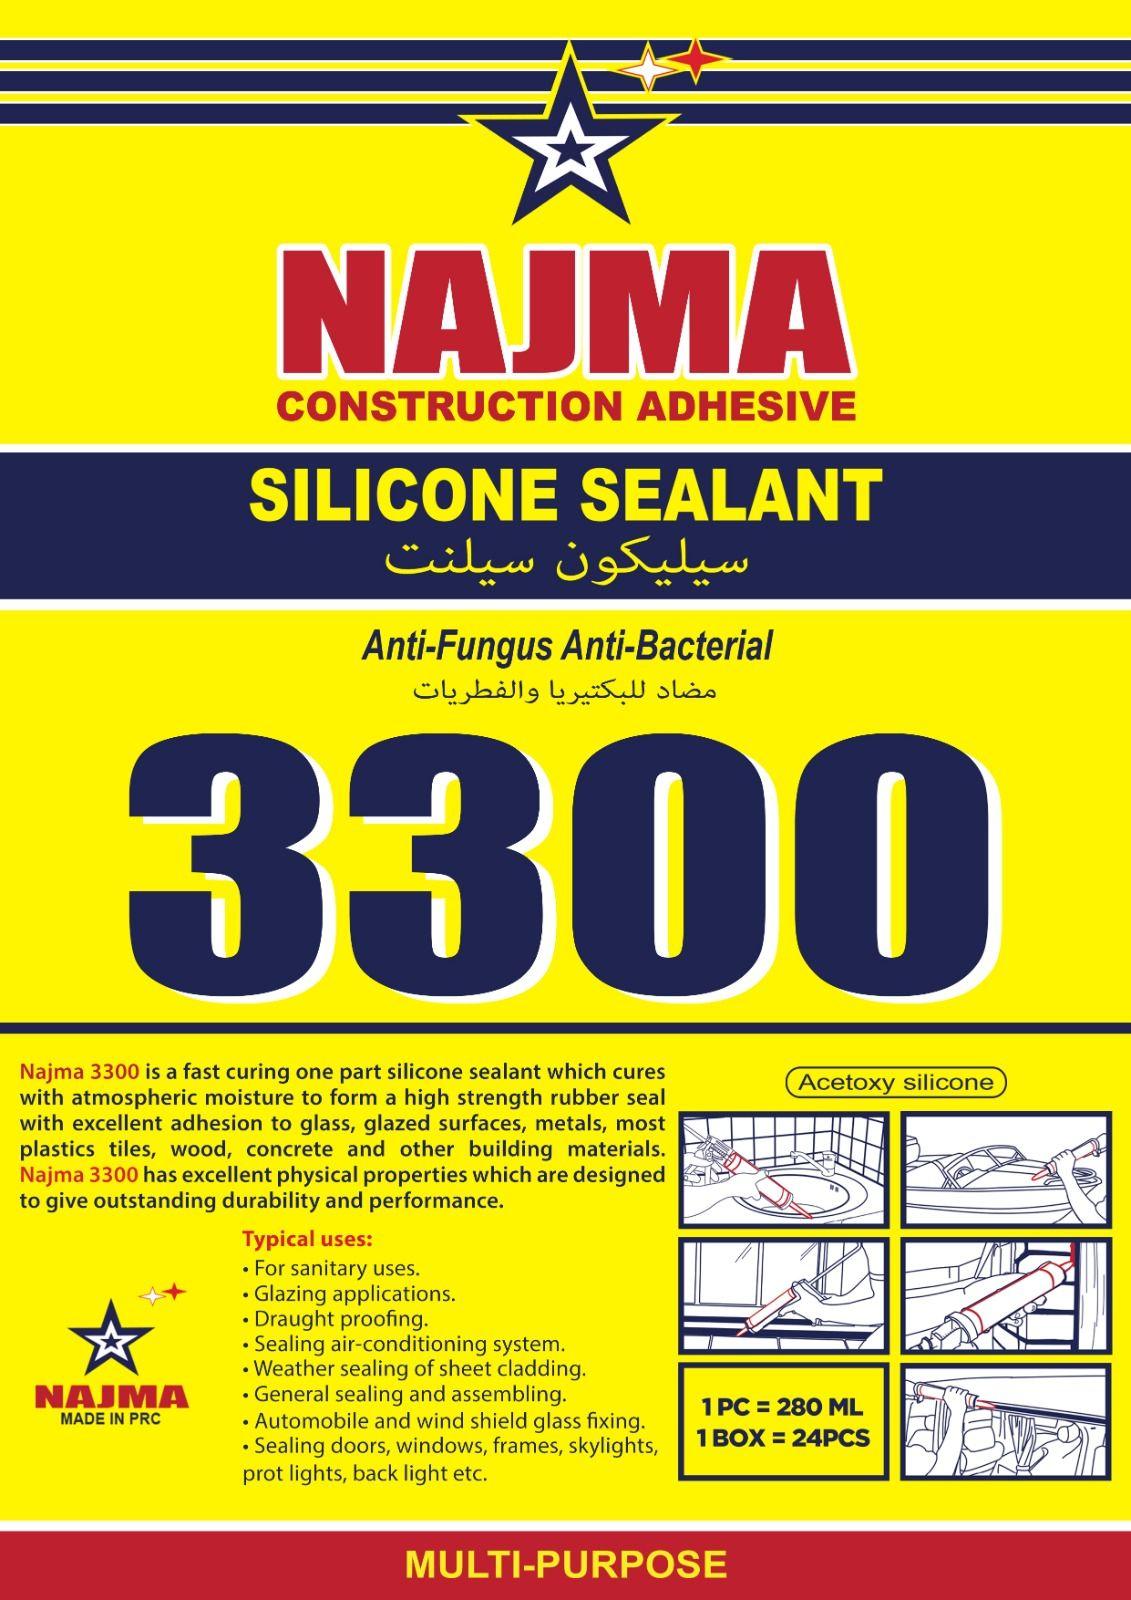 Silicone sealant adhesive qatar in 2020 Sealant